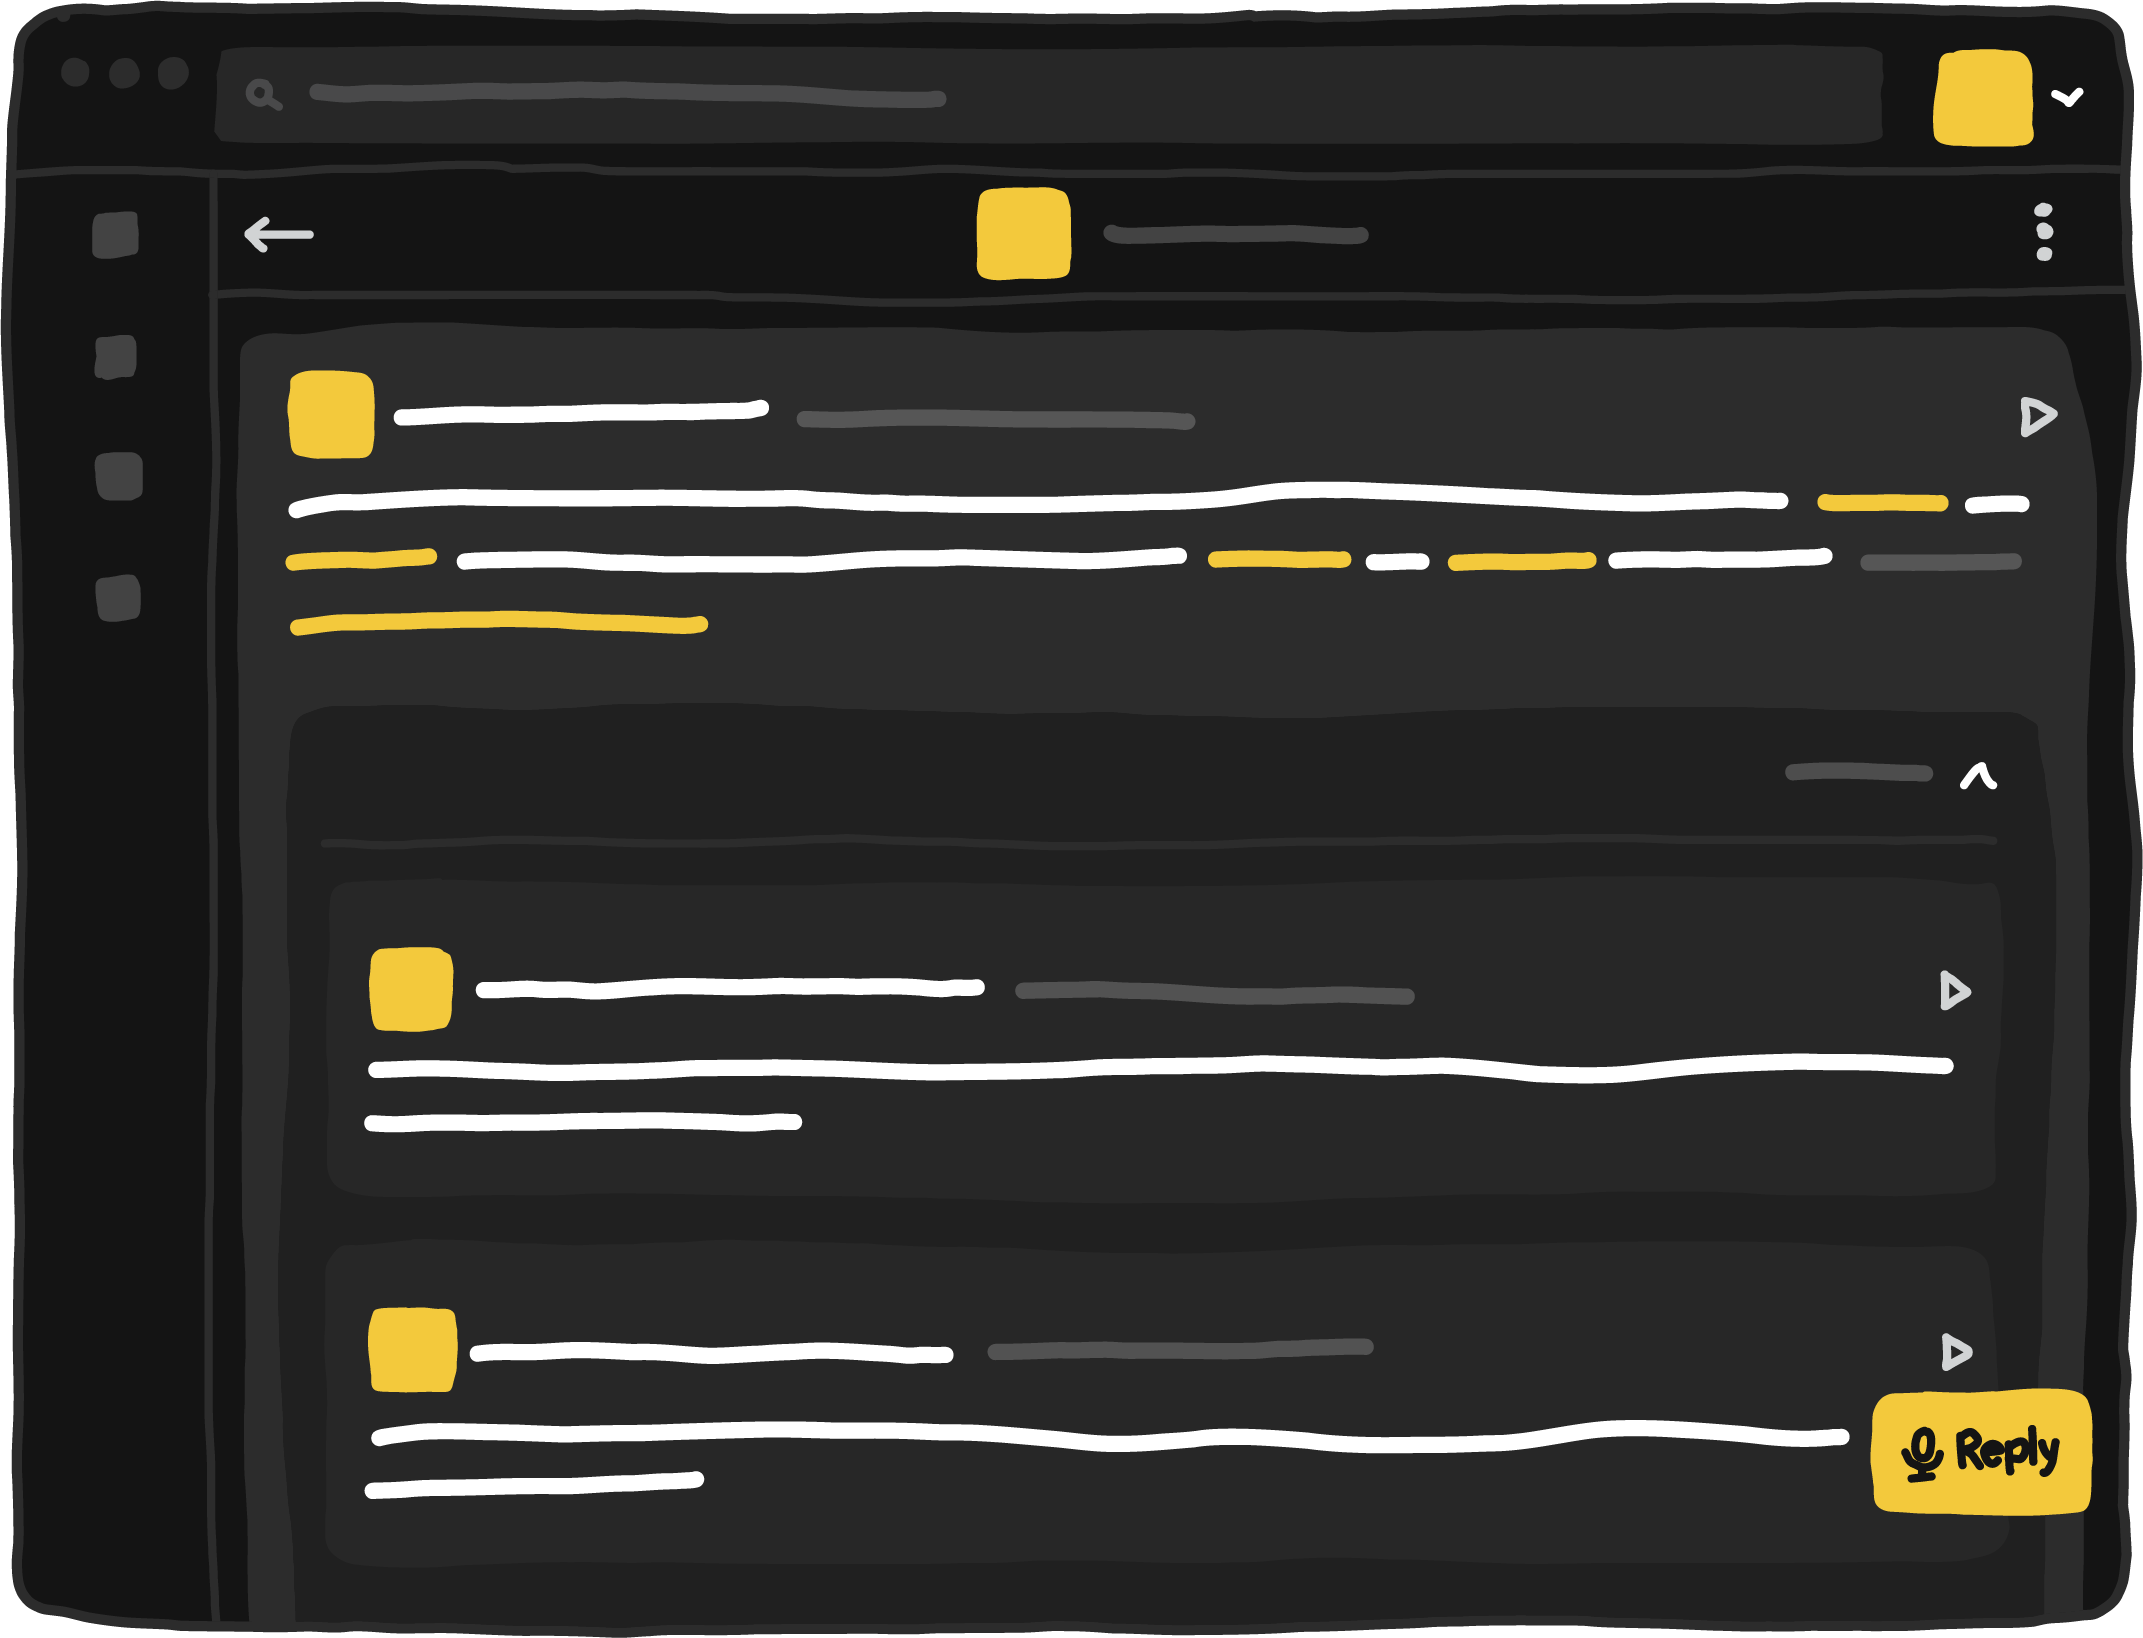 yac interface